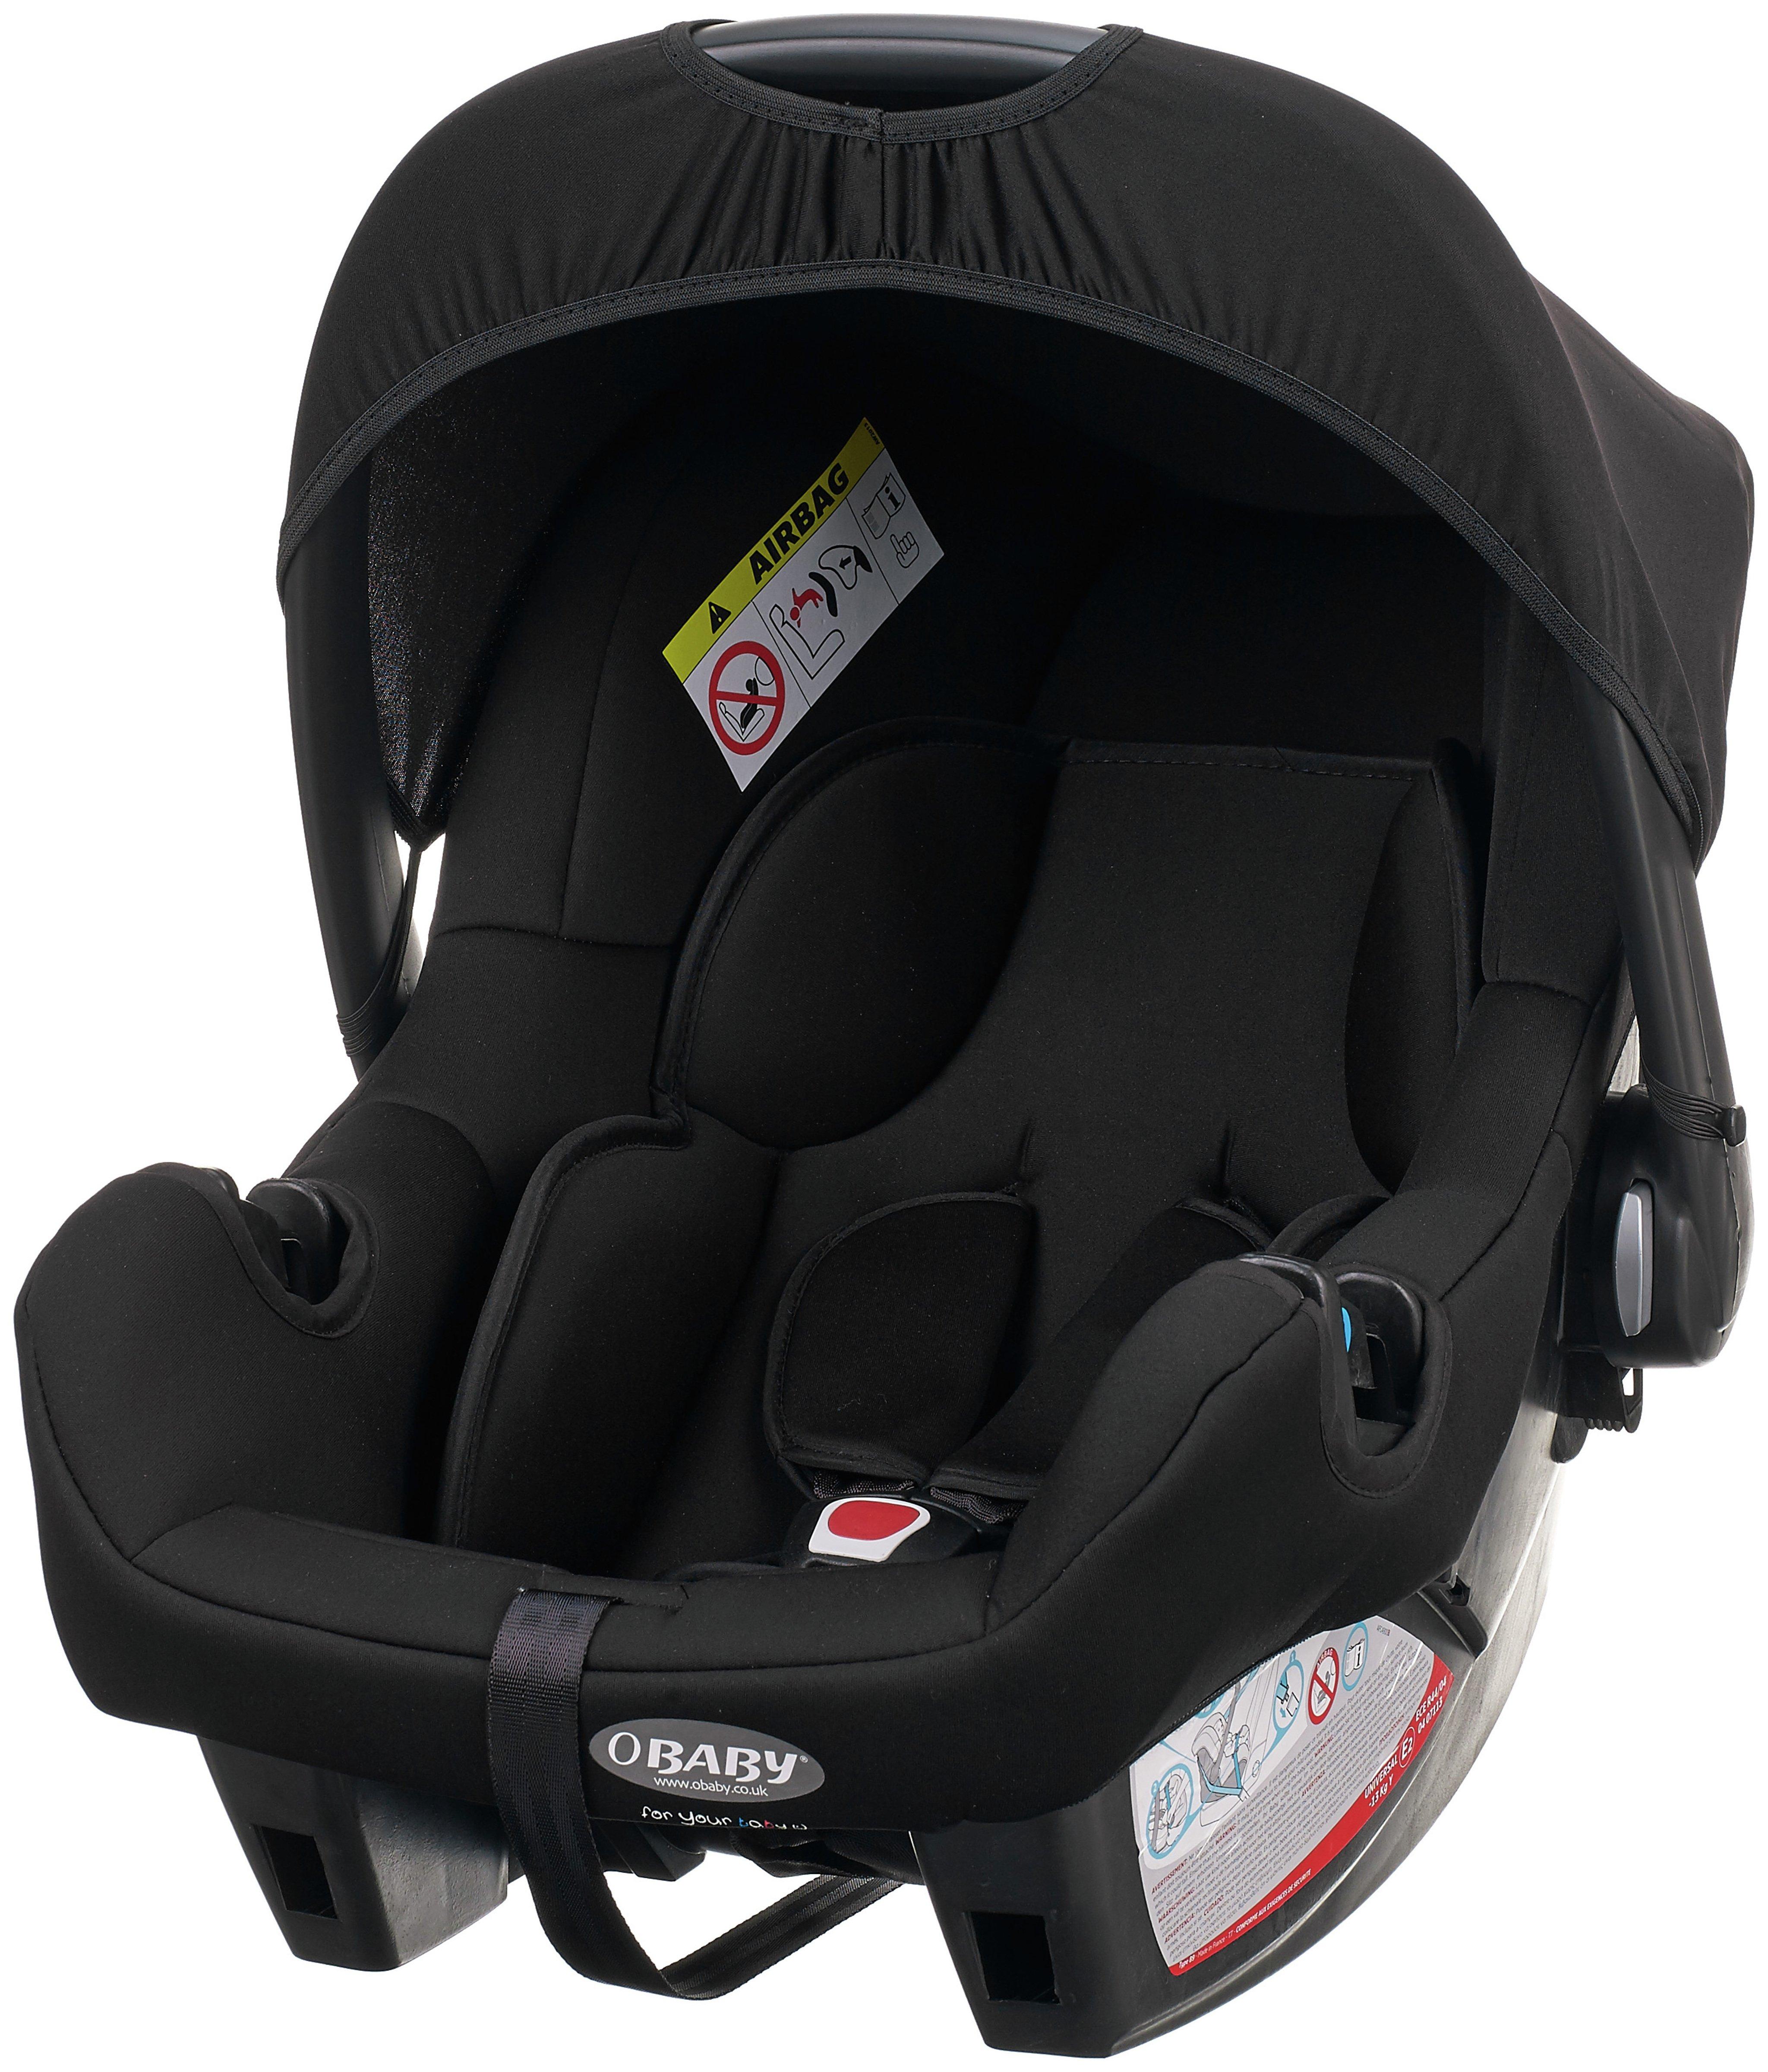 obaby-hera-group-0-infant-car-seat-black